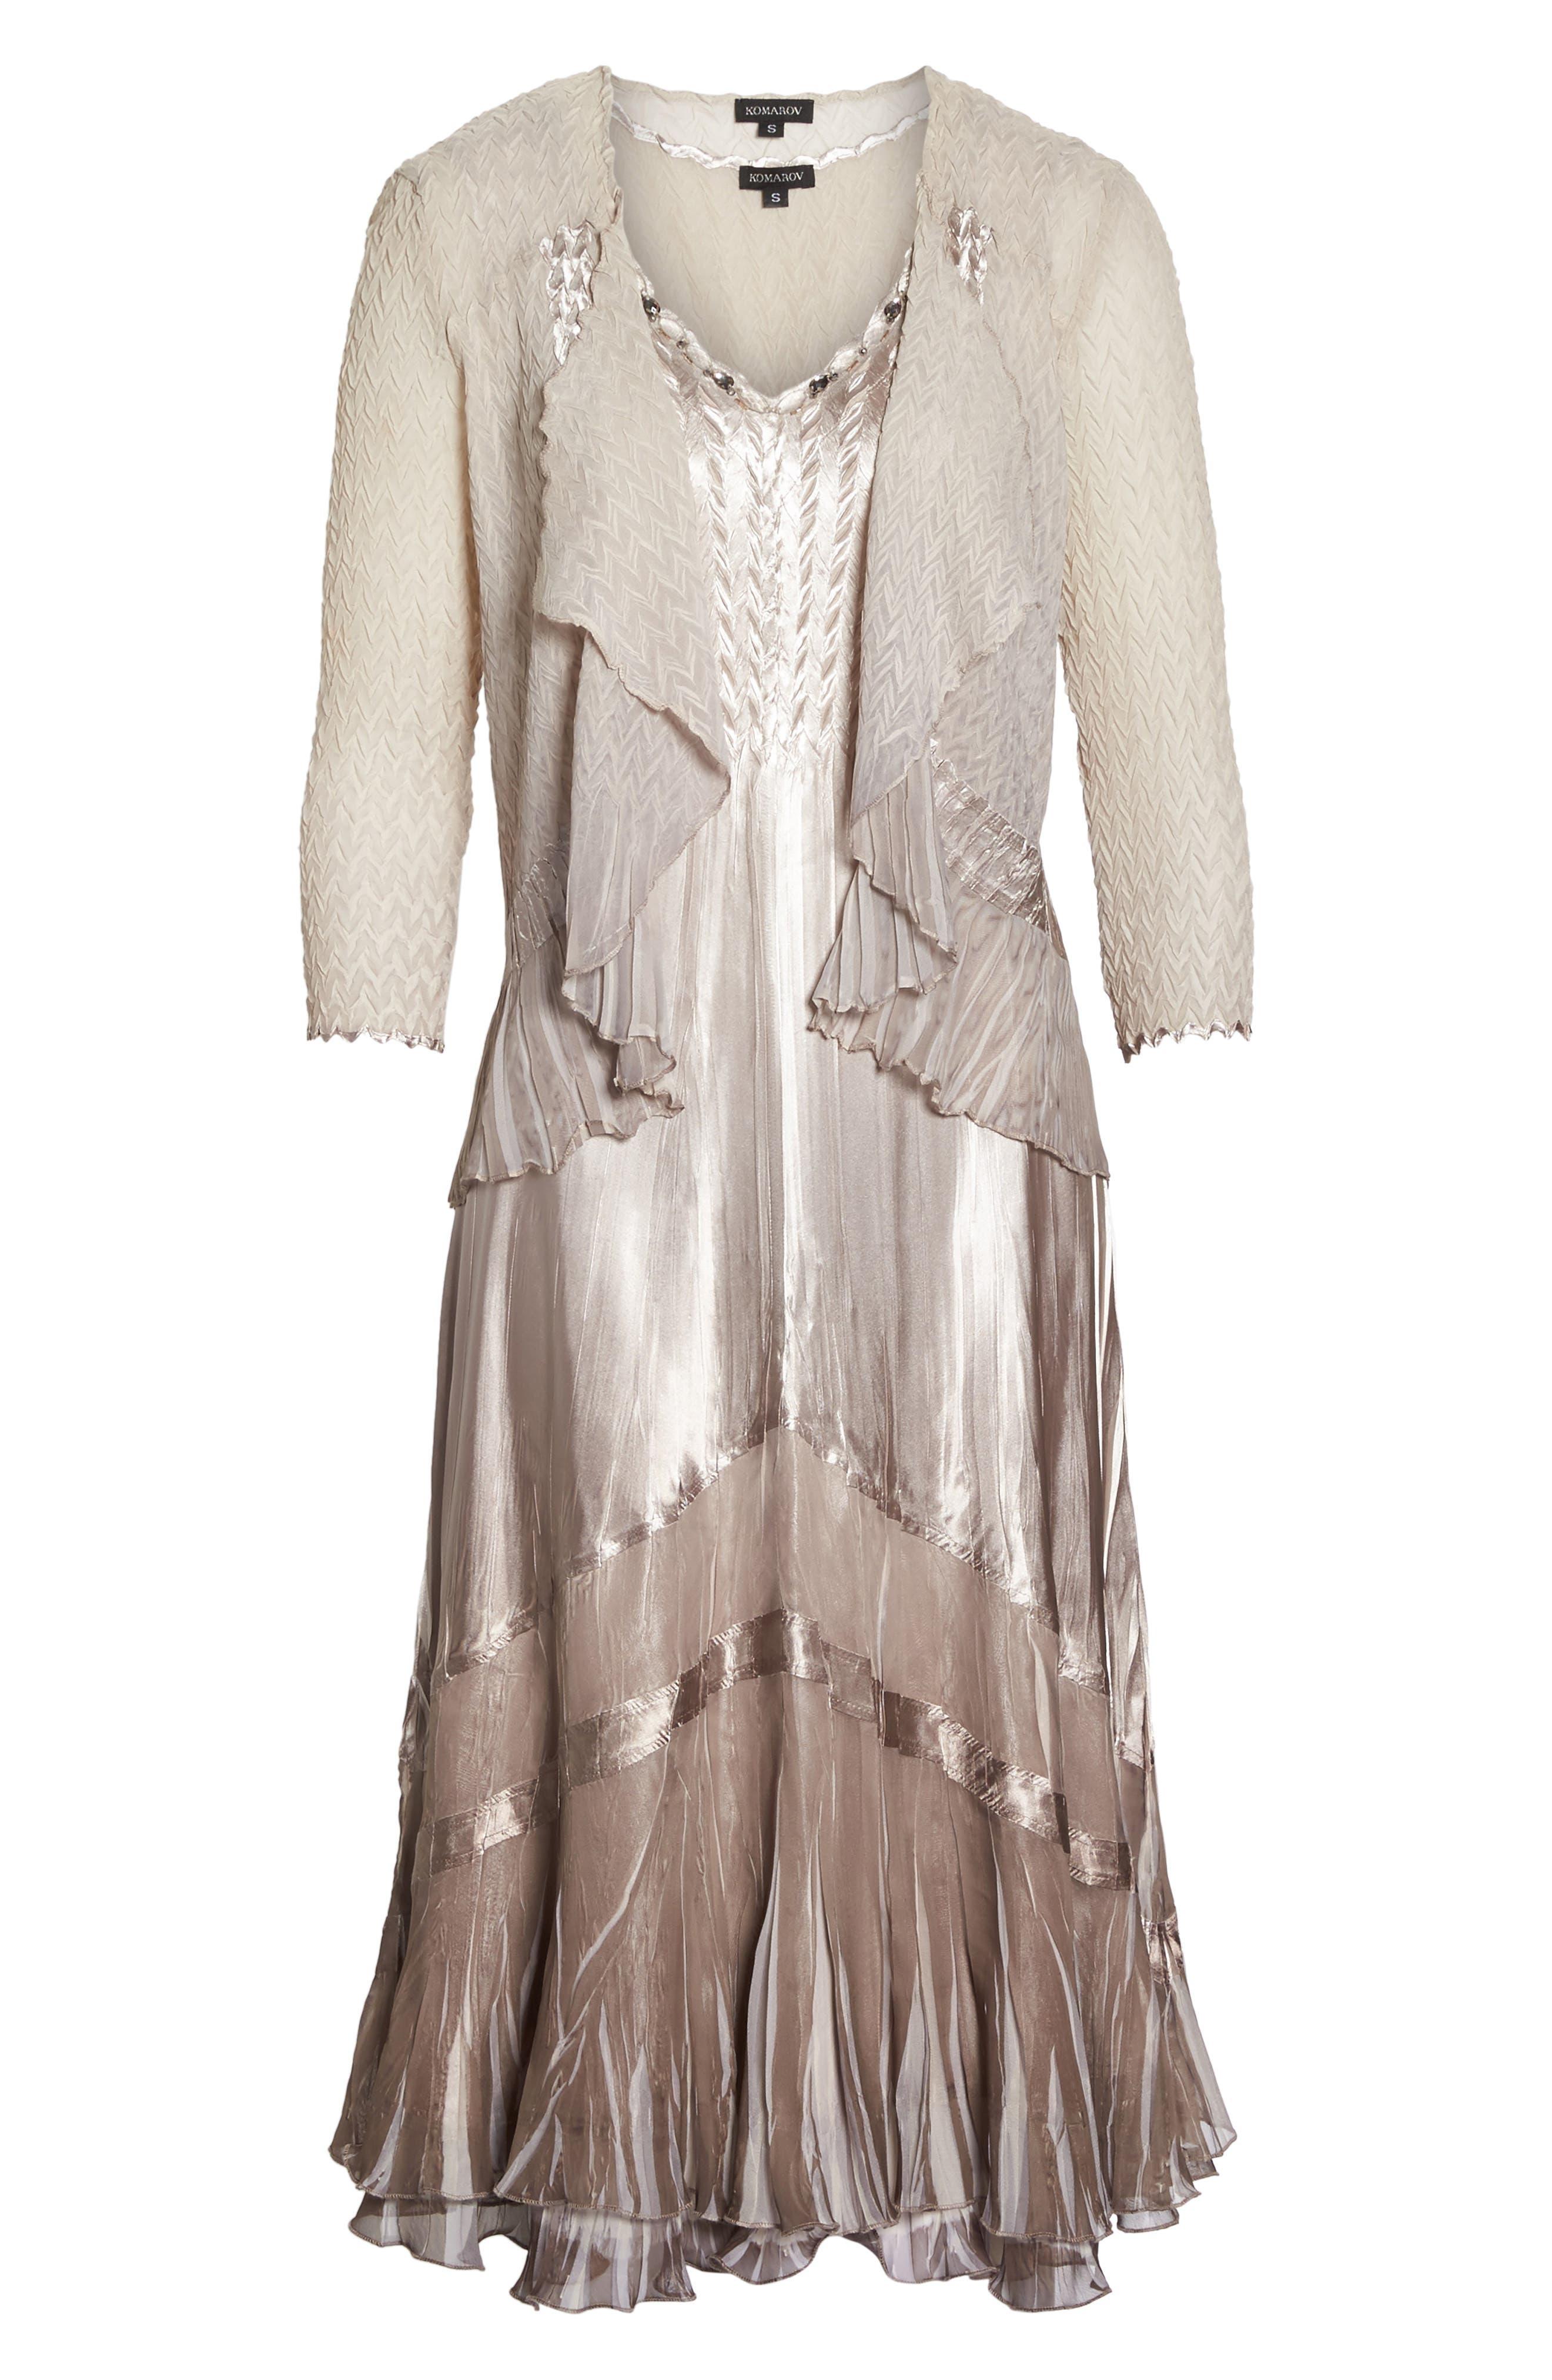 Beaded Charmeuse & Chiffon Midi Dress with Jacket,                             Alternate thumbnail 6, color,                             057